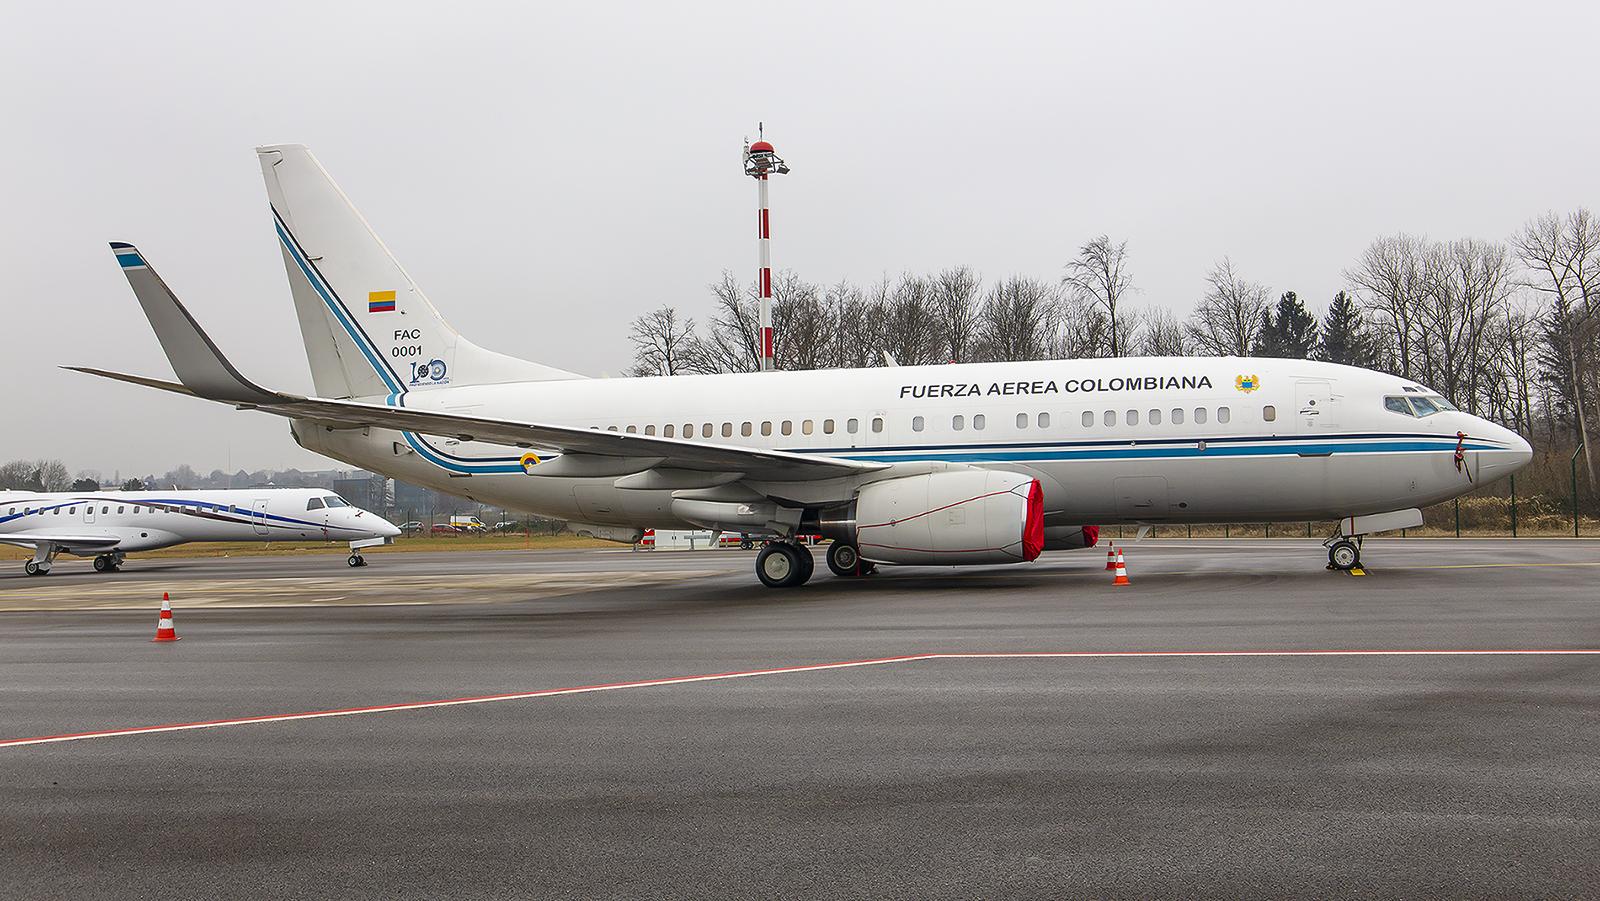 FAC0001, Boeing 737-74V (BBJ) der Fuerza Aerea Colombiana